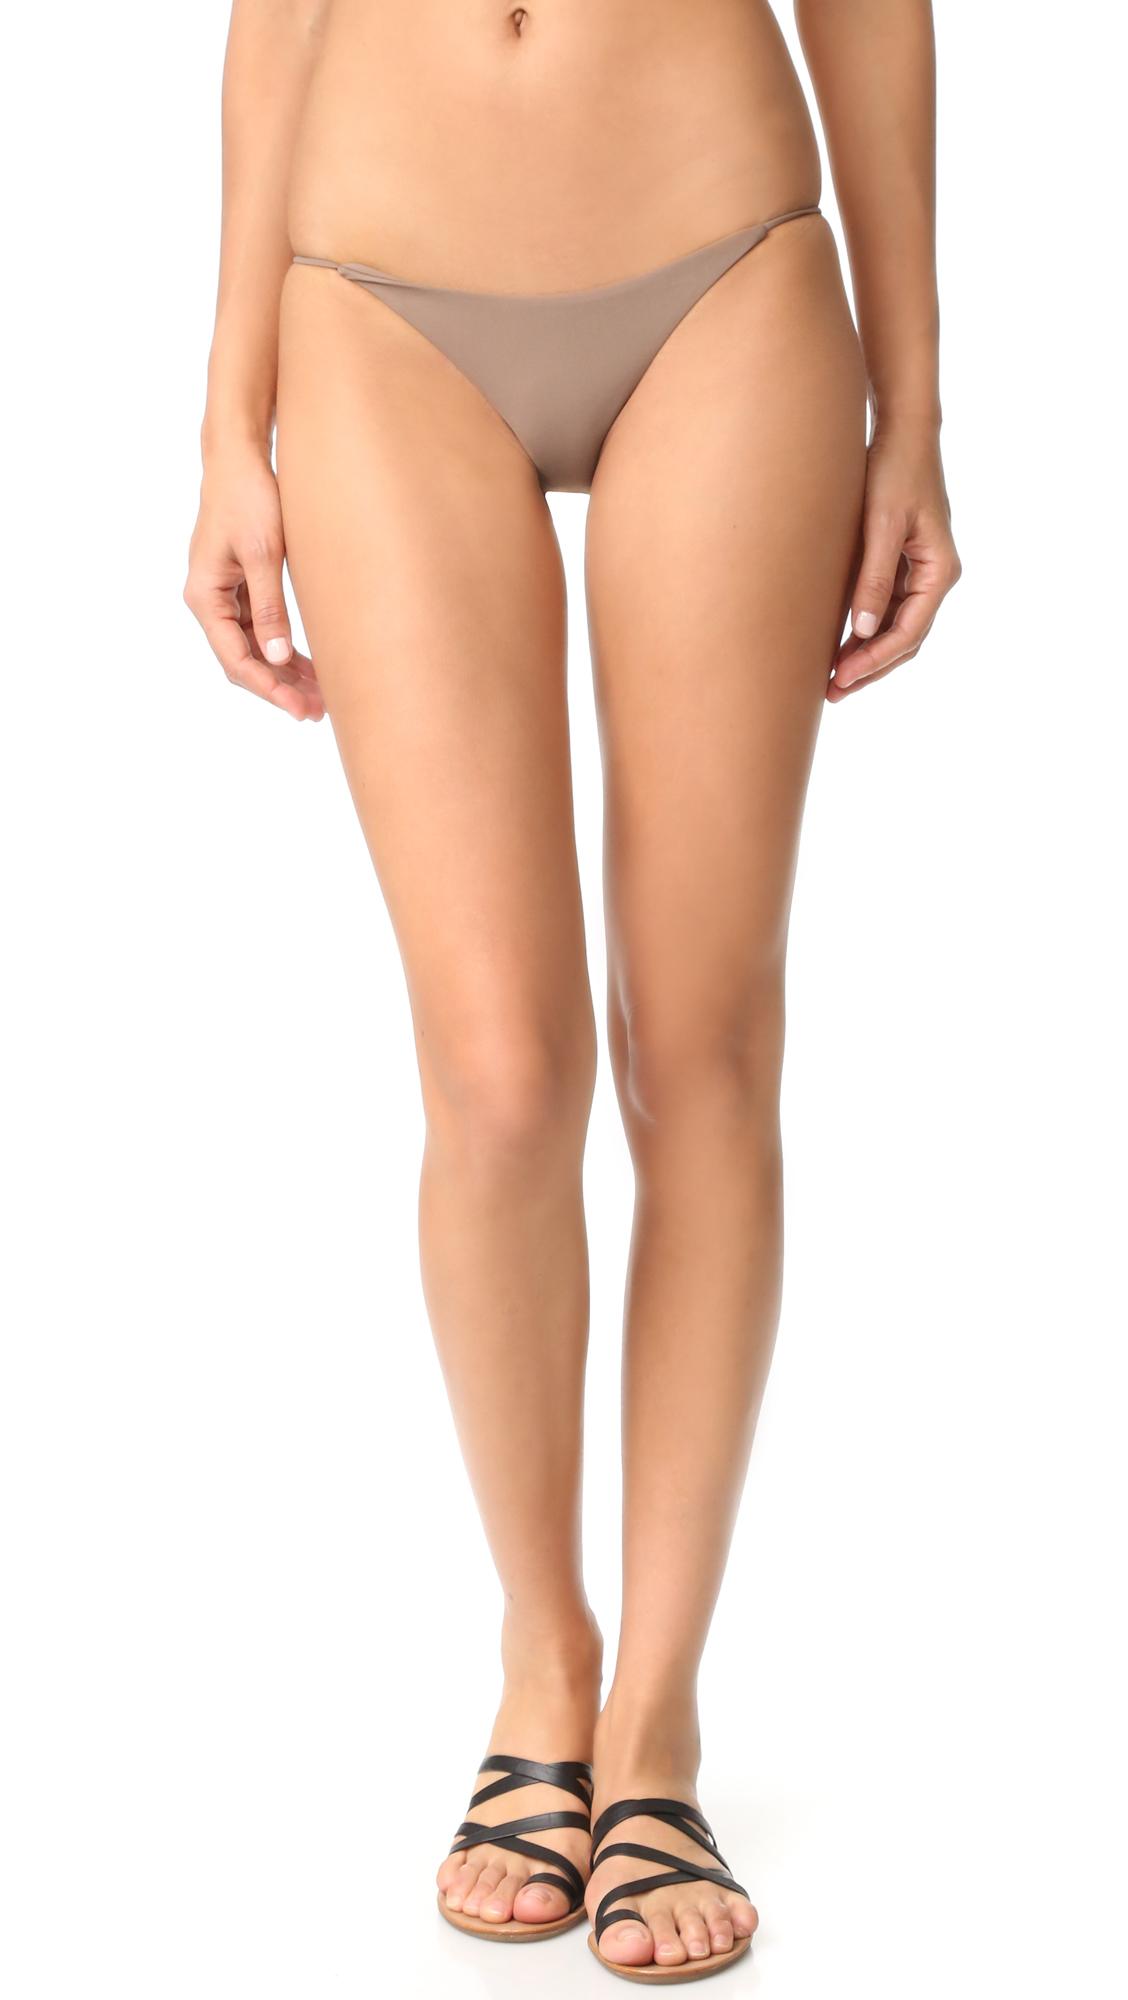 Jade Swim Bare Minimum Bottoms - New Nude at Shopbop